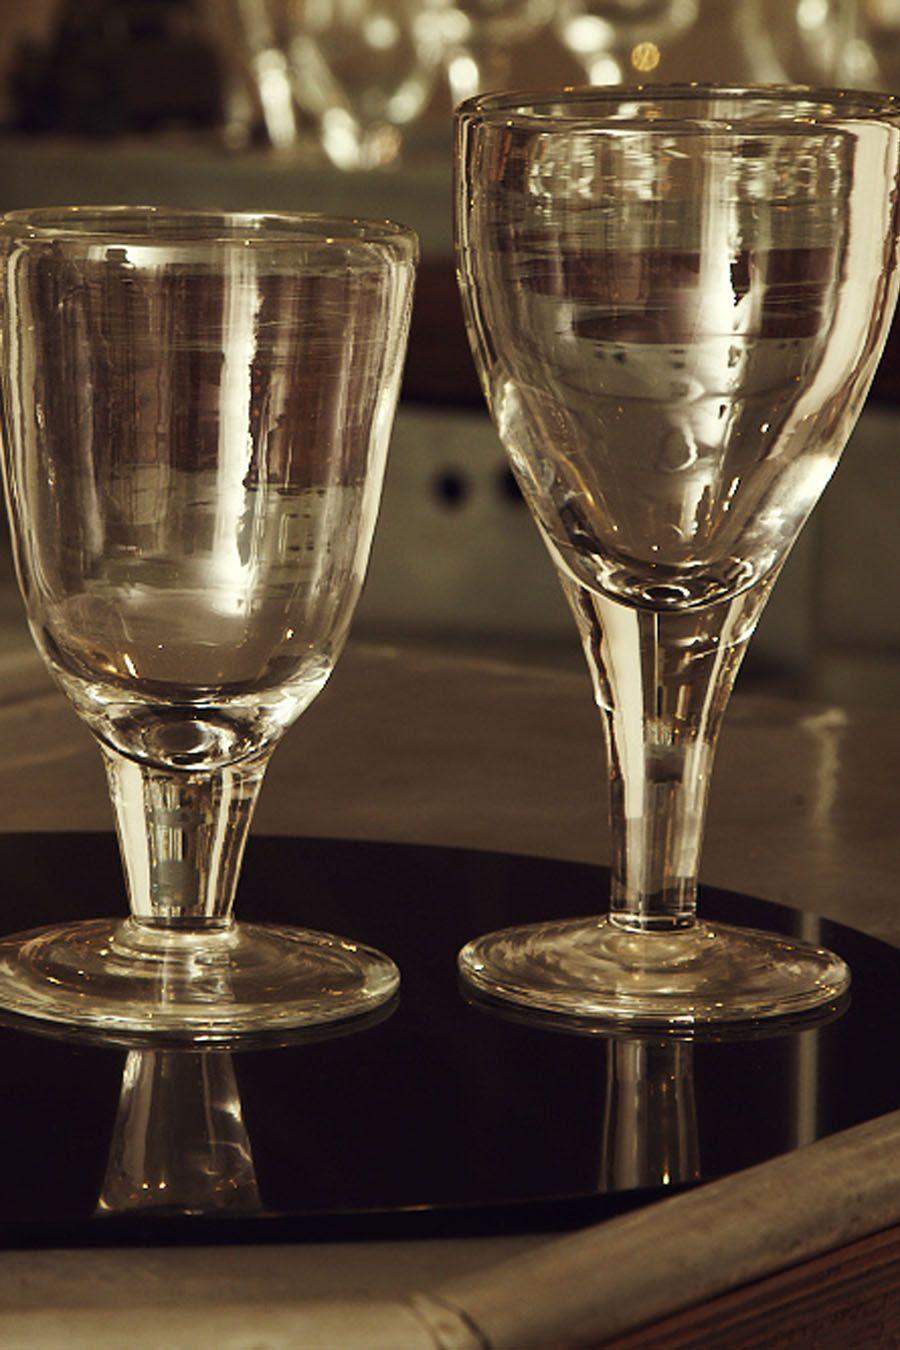 objets   verres à vin en verre soufflé   Glassware   Glass, Henry ... 6f4f70521628